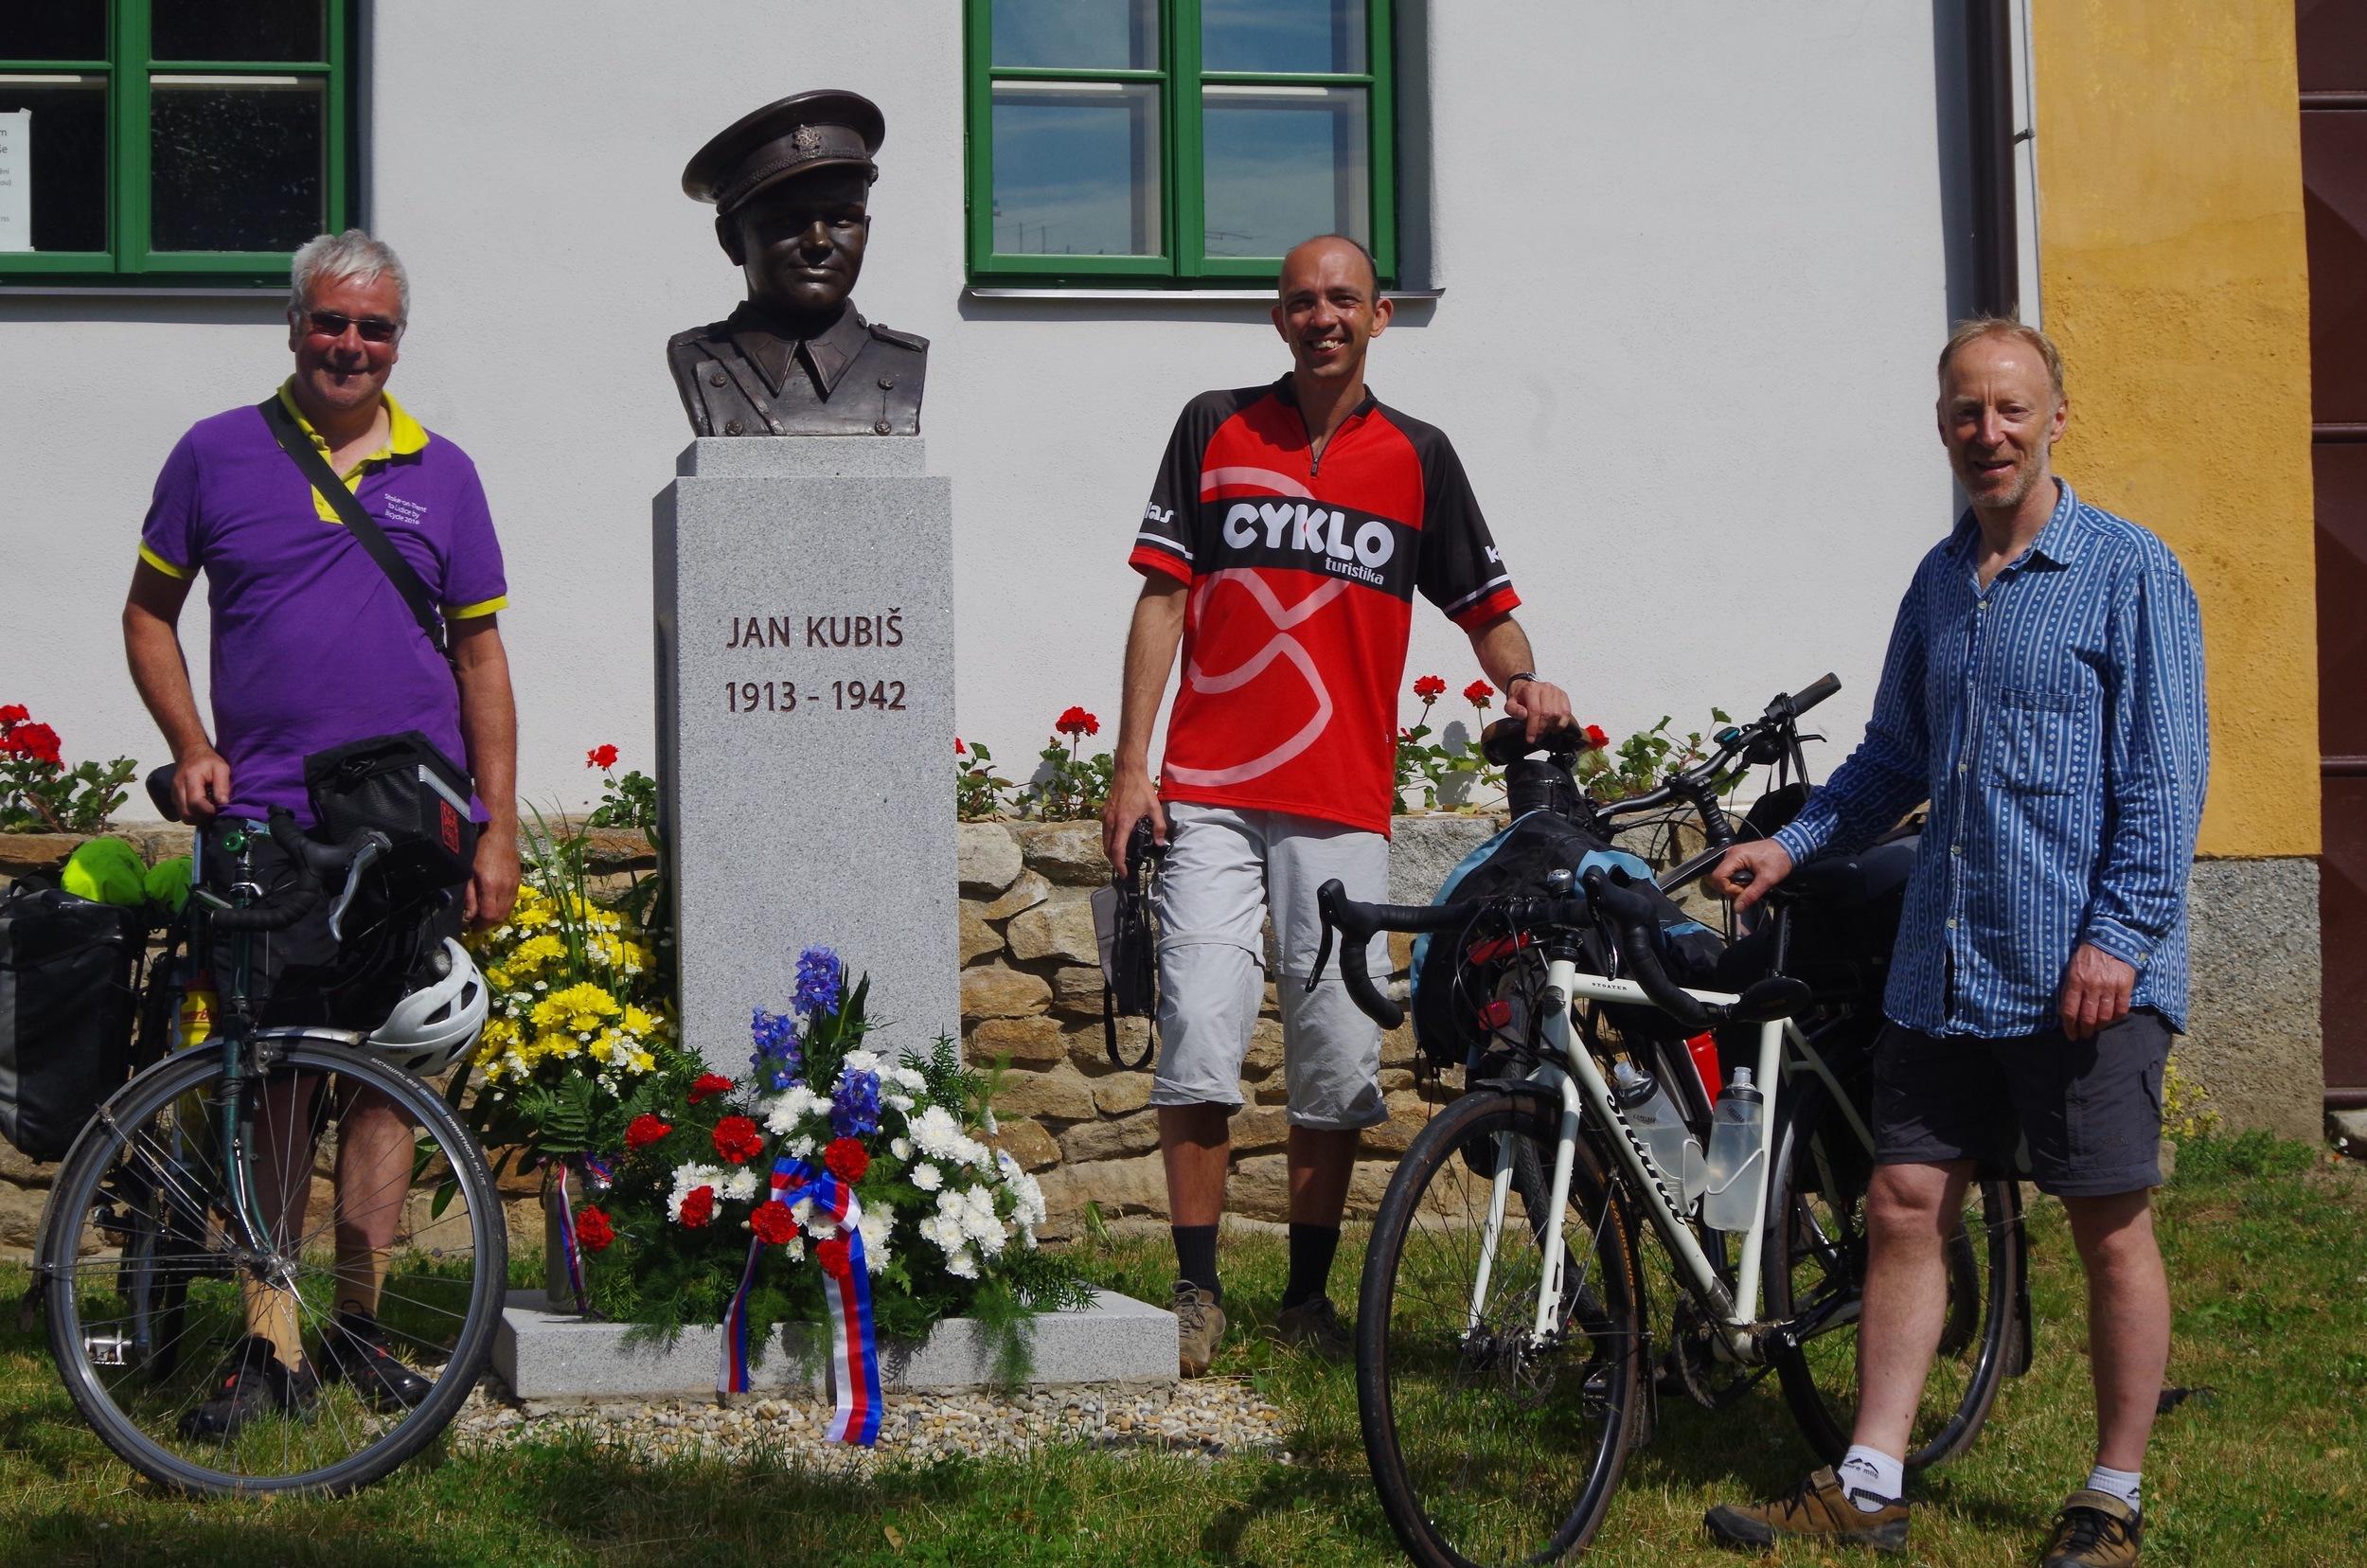 At the Jan Kubis memorial: Steve, Milan Krcmar, Mark